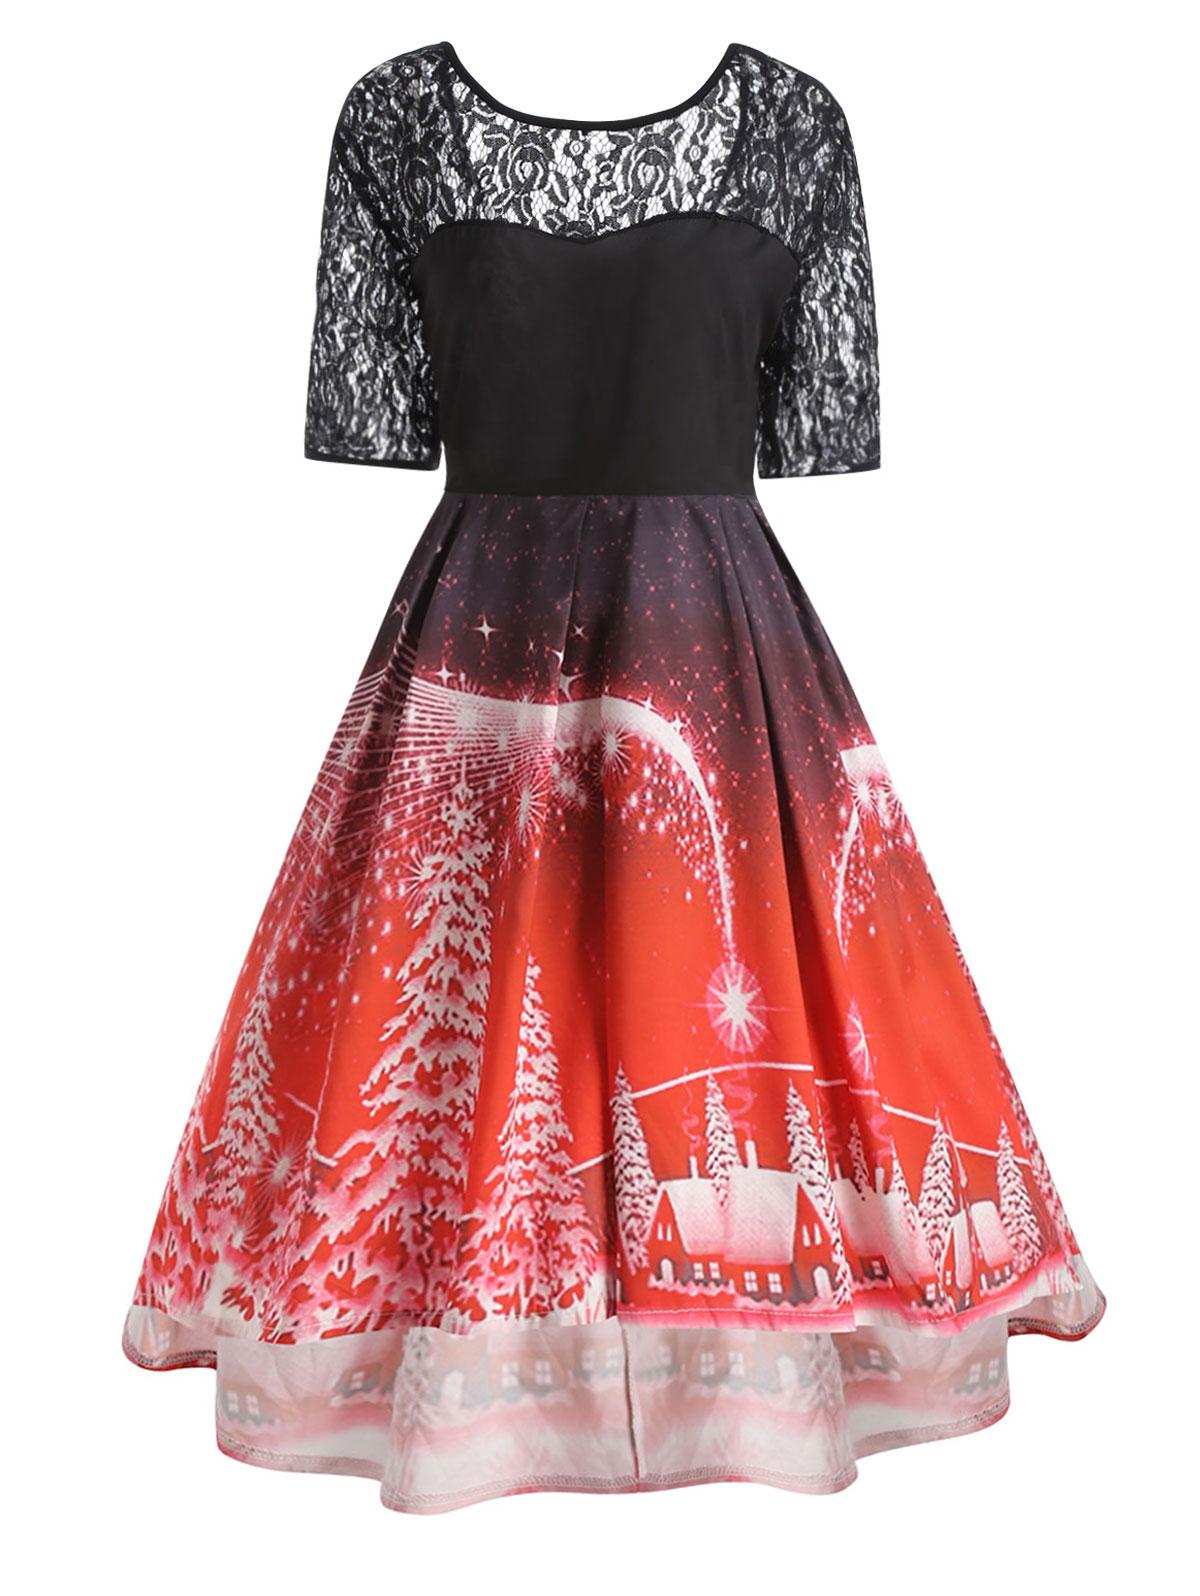 d06cdd7934 US $15.69 45% OFF|Wipalo Christmas Party Lace Panel Dress Plus Size XL 5XL  Rockabily Vintage Princess Dress Women Autumn Cute Robes Femme Vestidos-in  ...